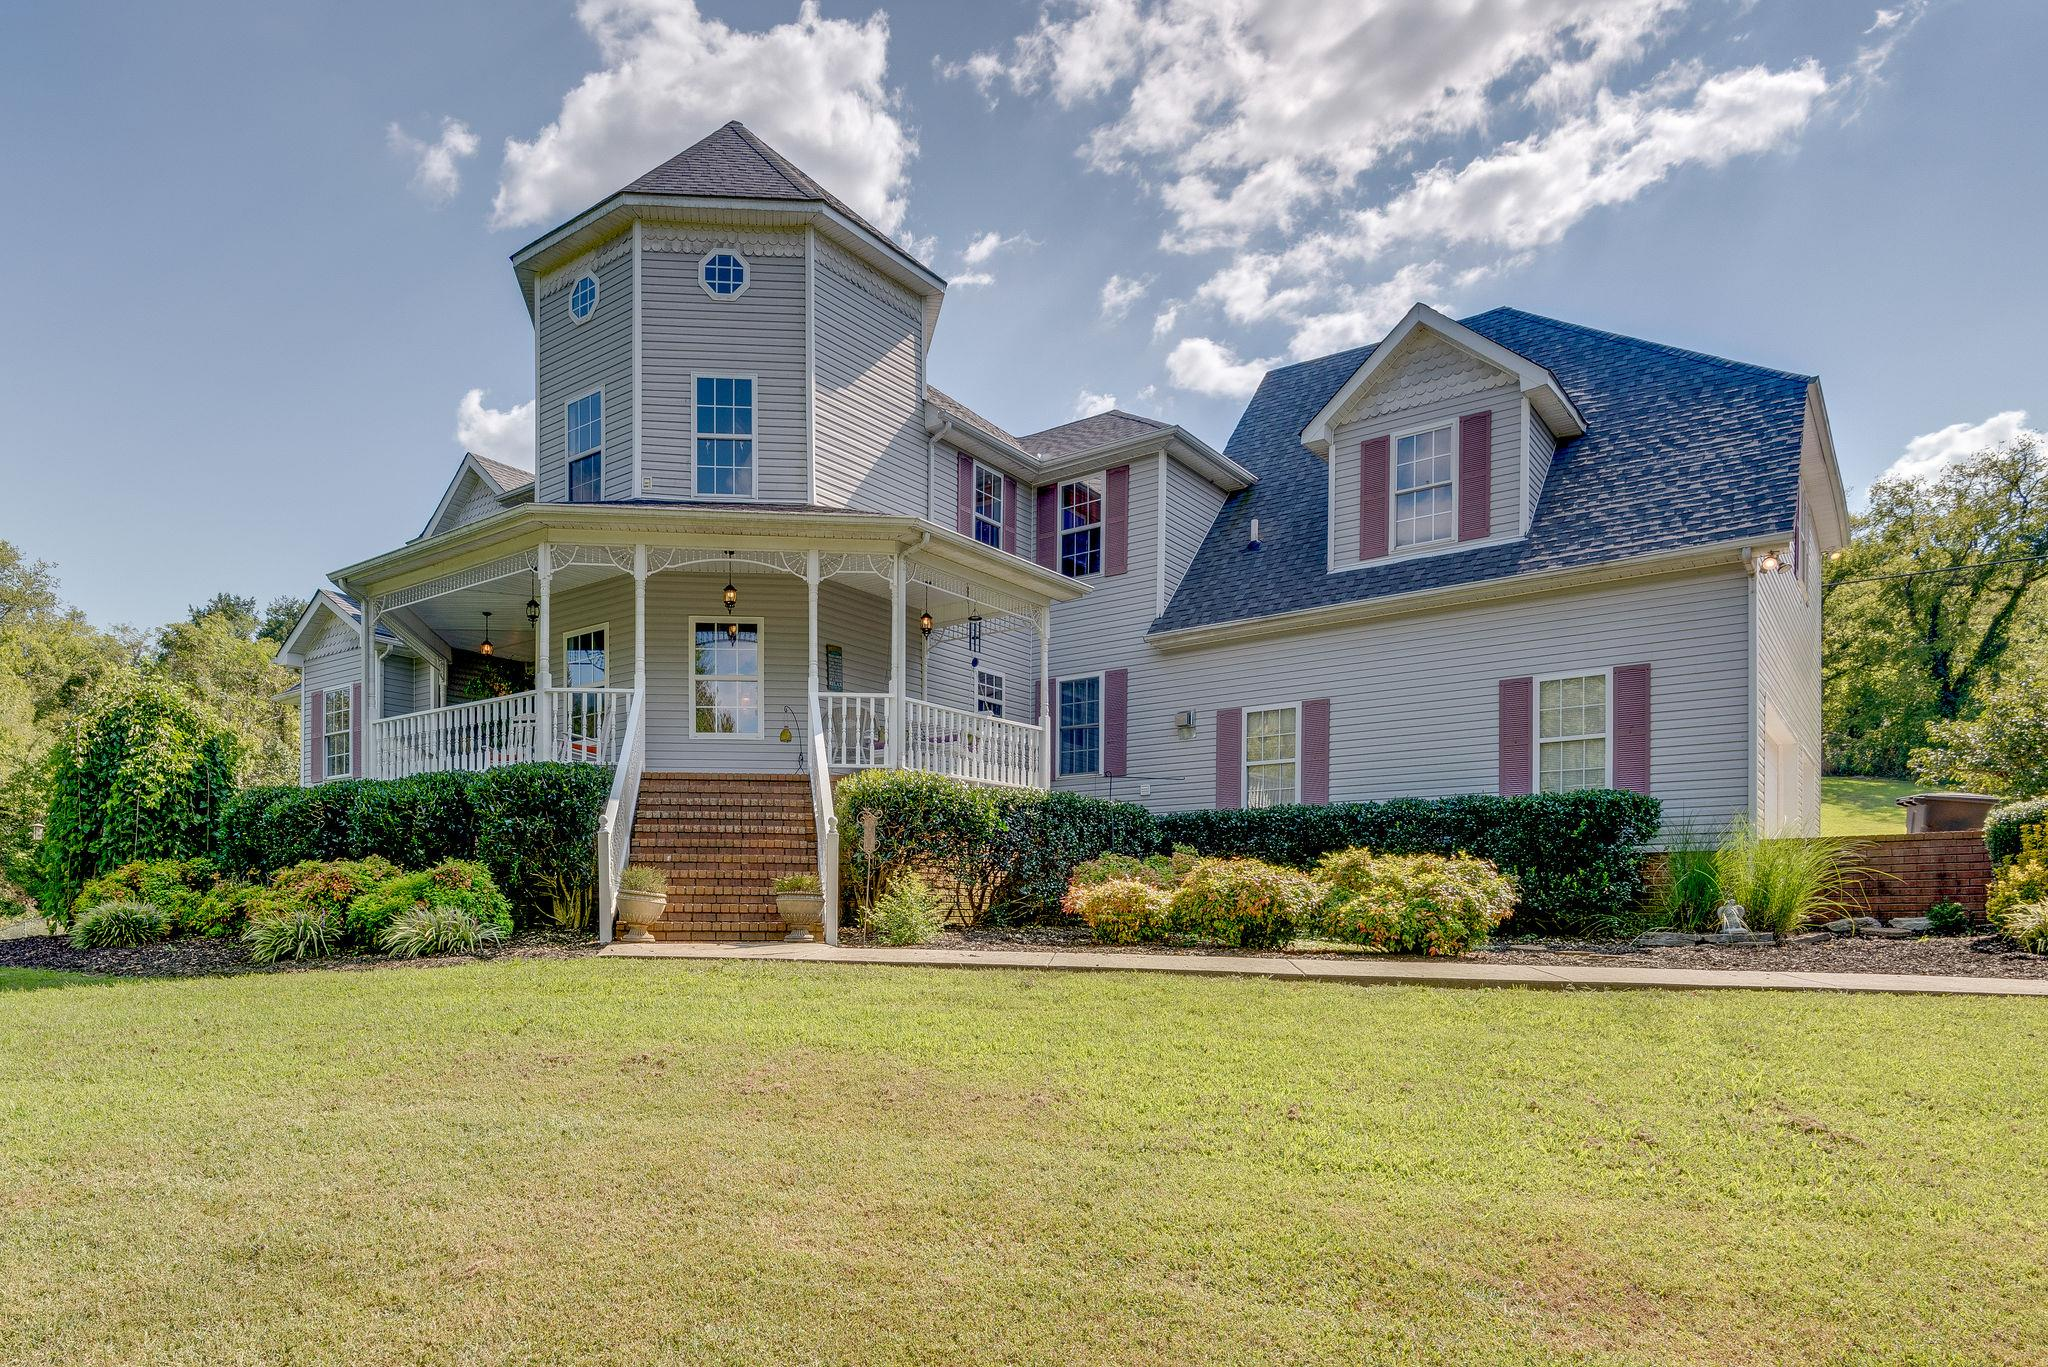 4298 Burt Burgen Rd, Woodbury, TN 37190 - Woodbury, TN real estate listing